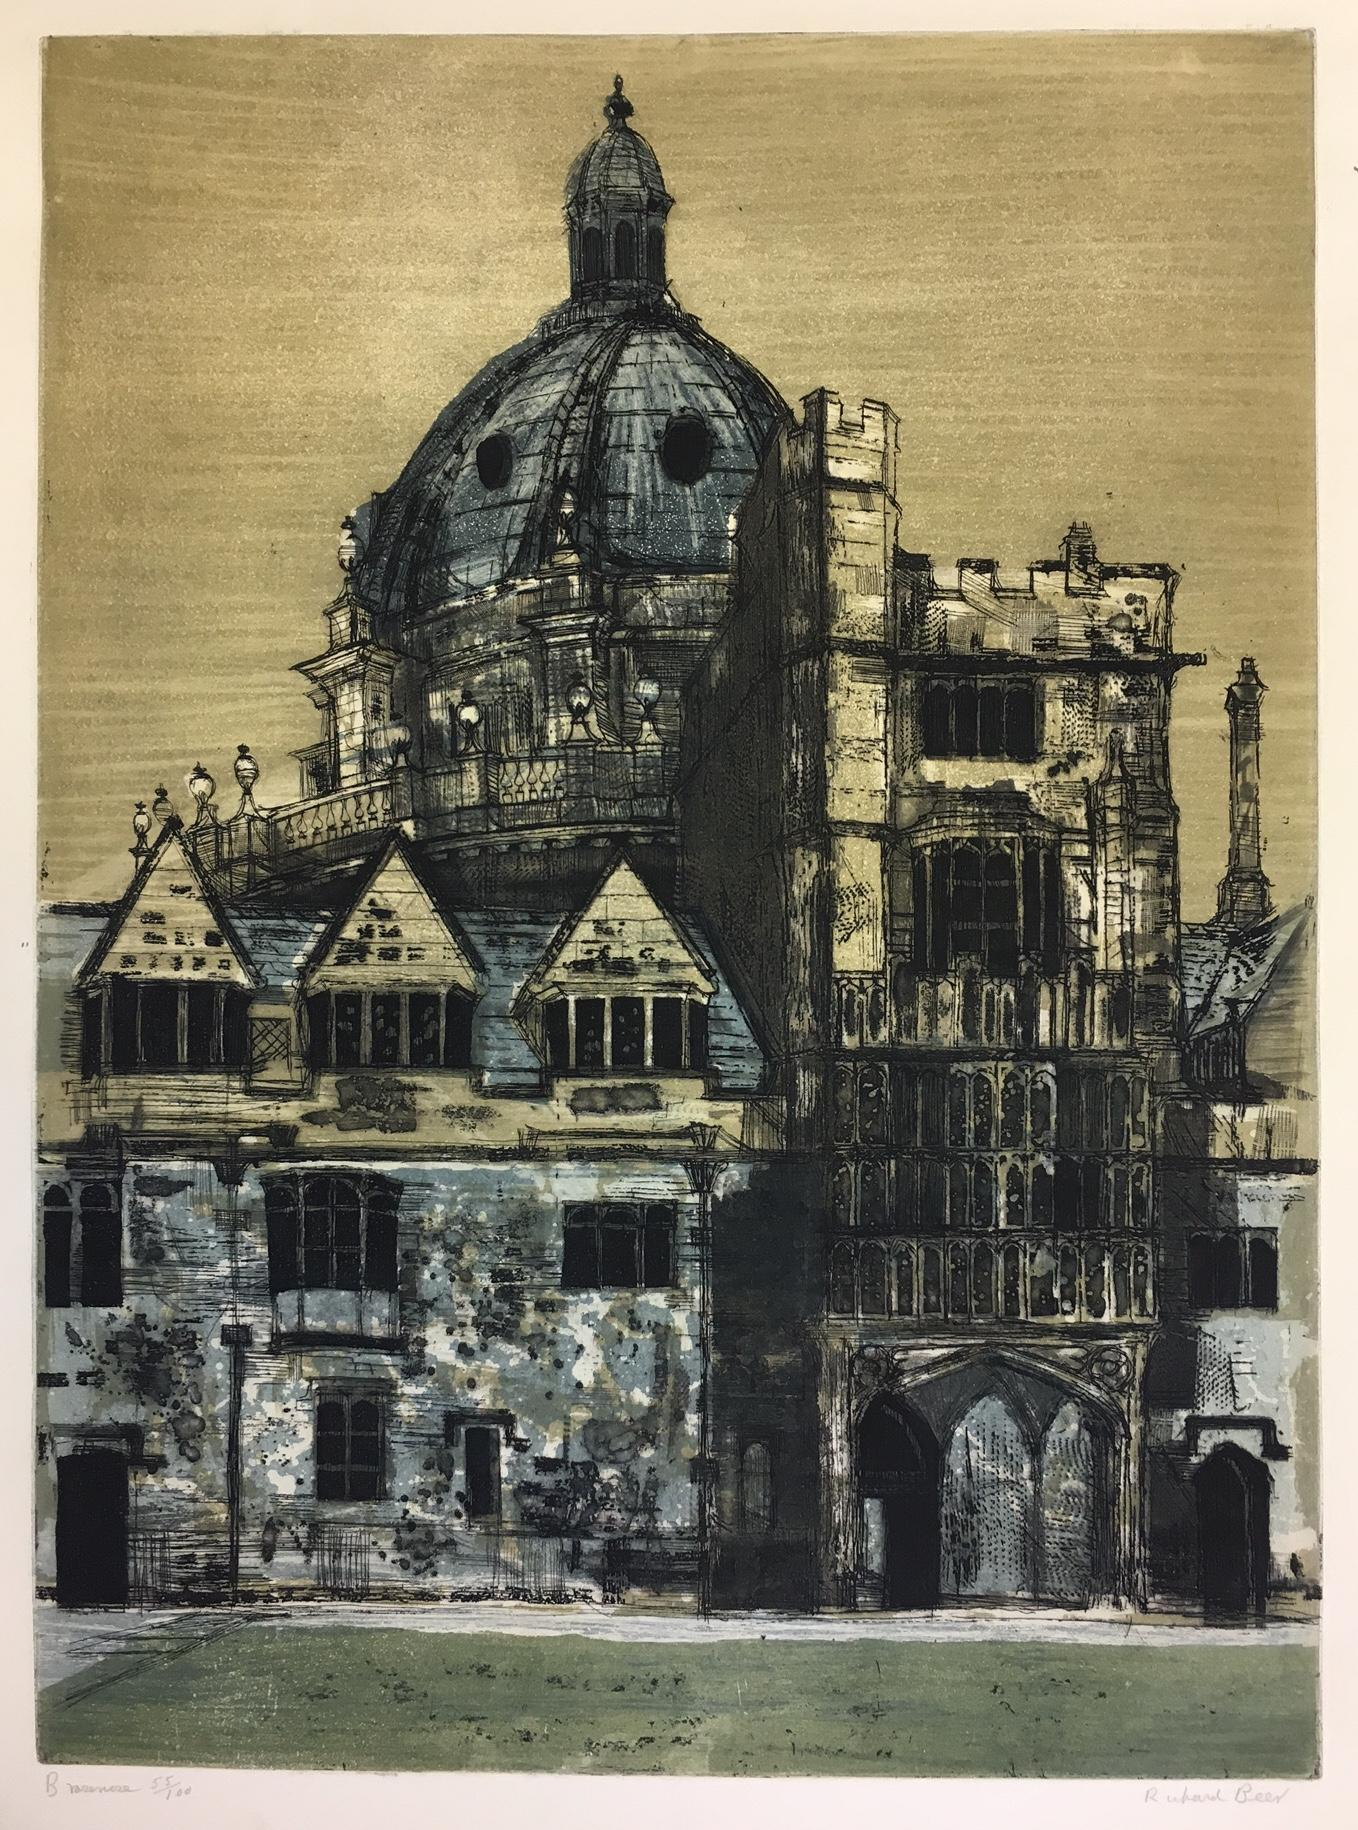 Richard Beer Brasenose College Oxford 1965 etching & aquatint print mid century